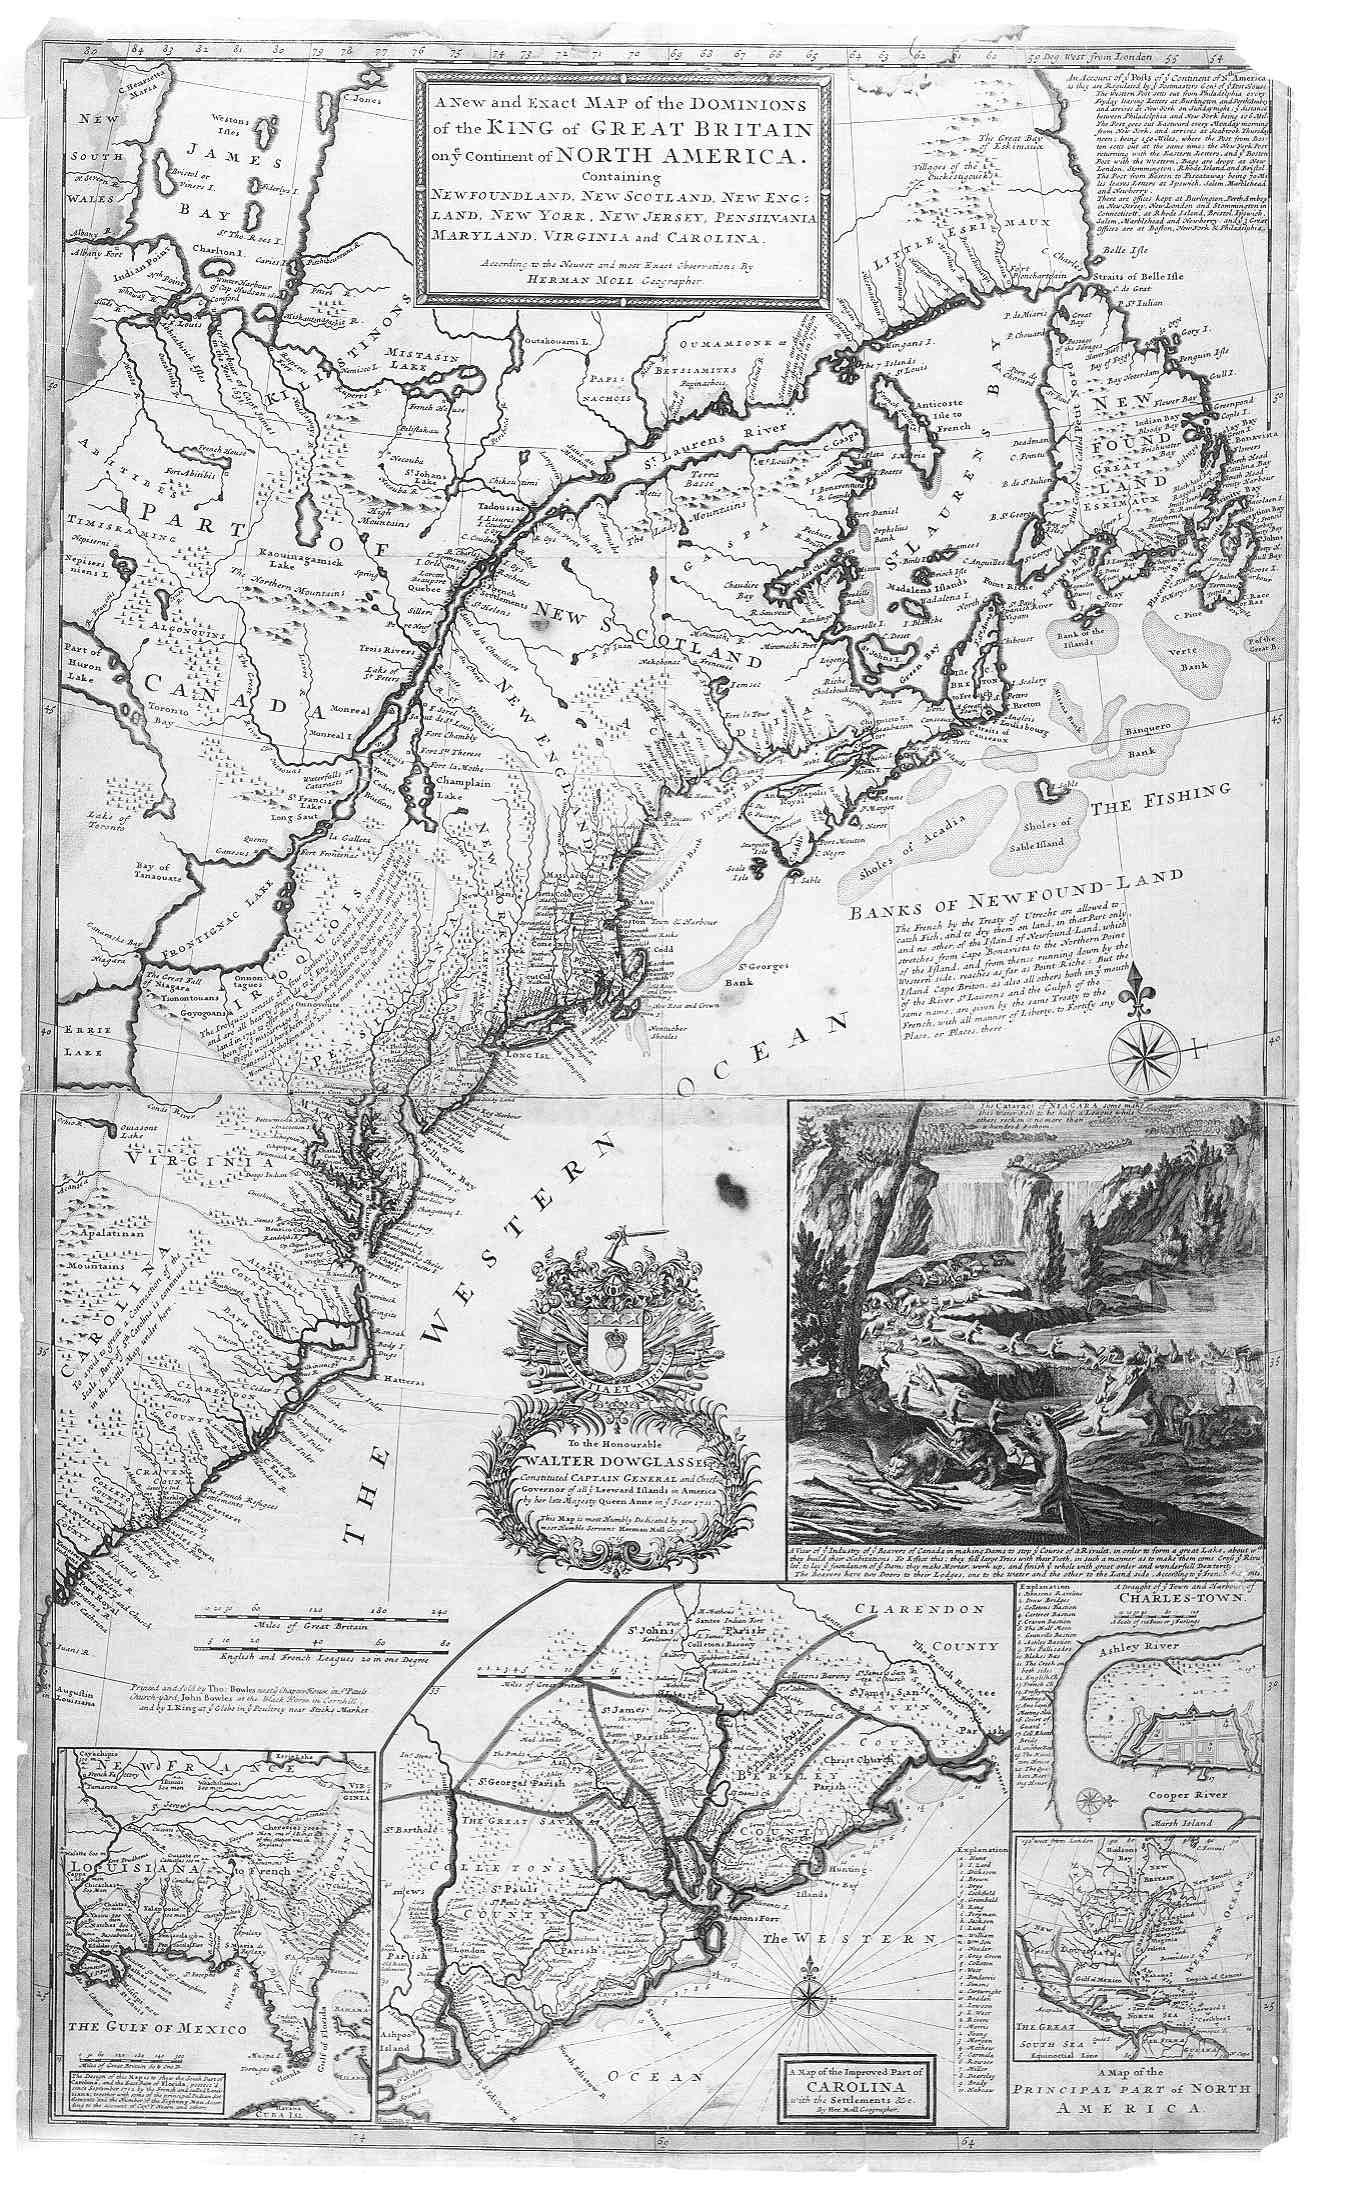 North Carolina County Map - 1920s north eastern us map